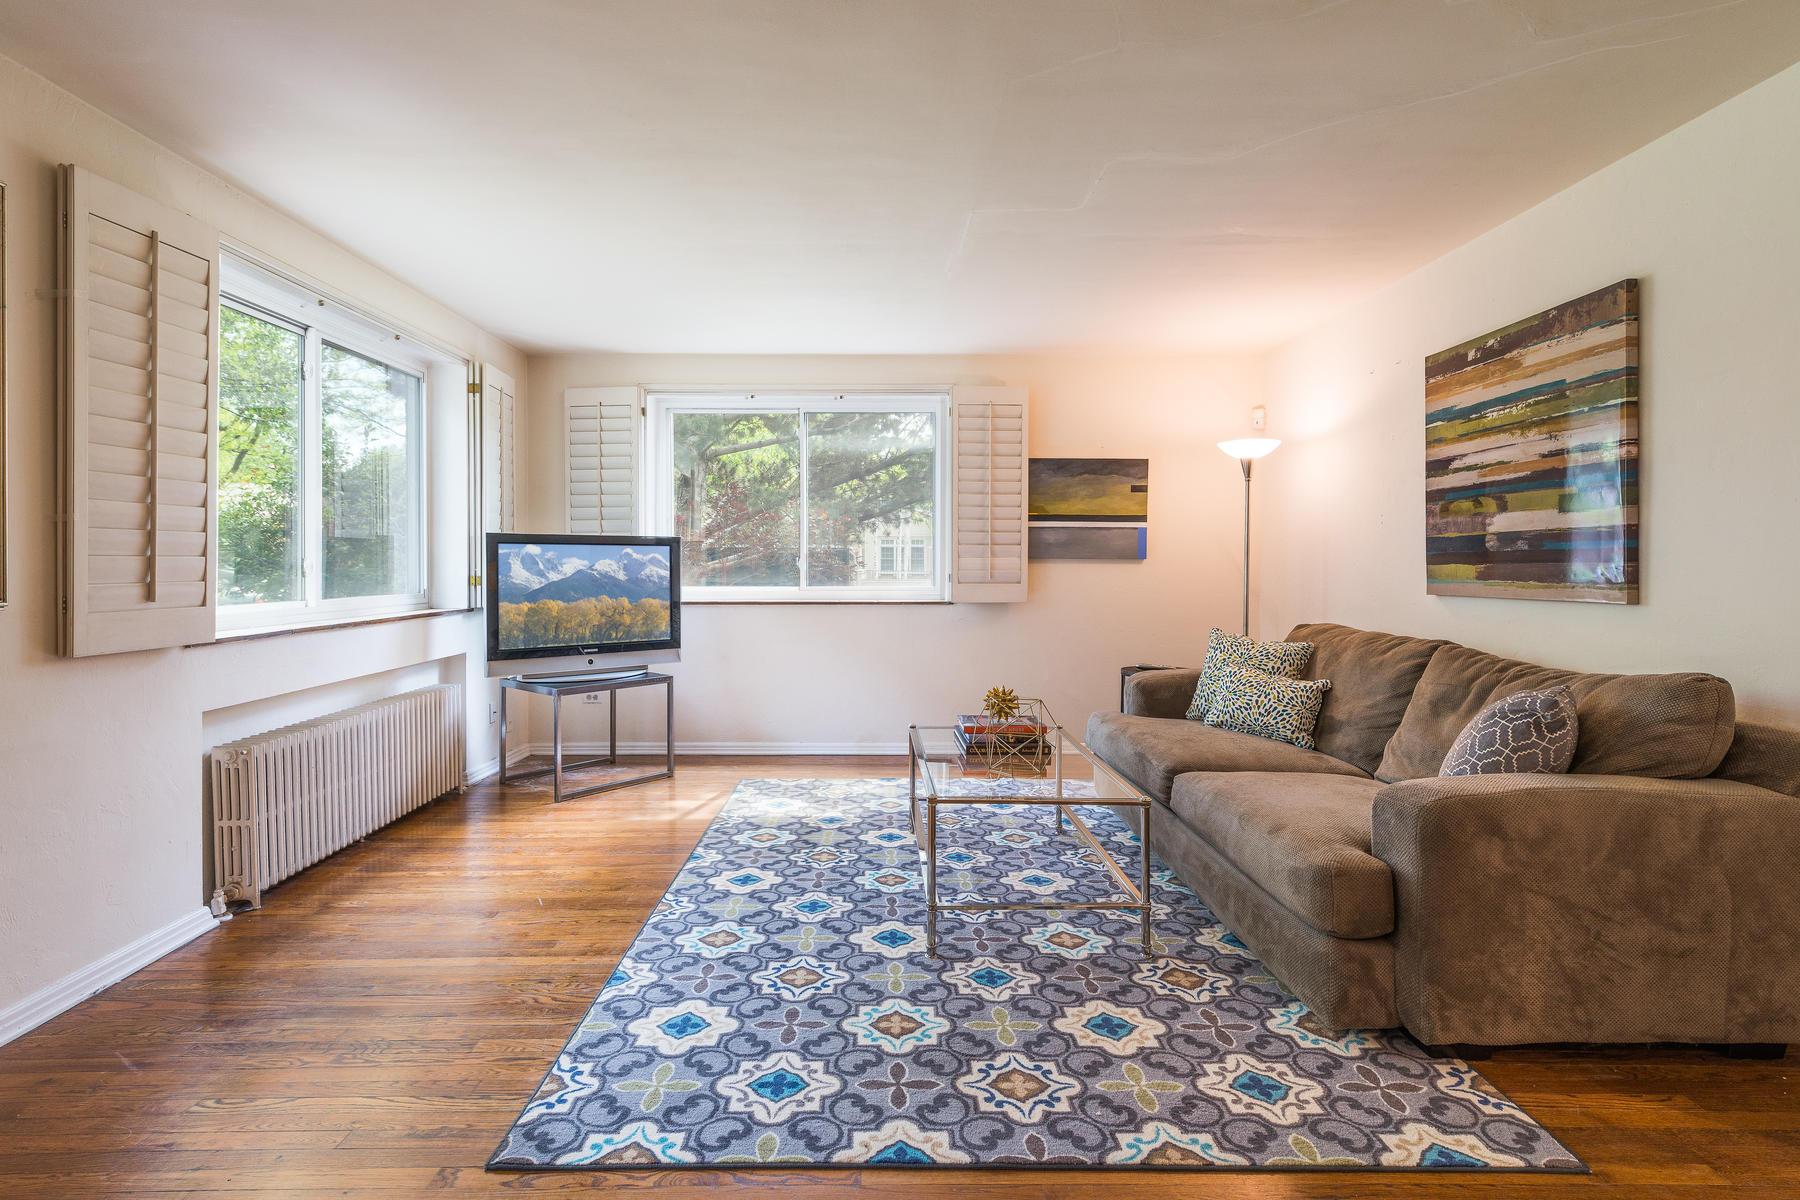 Condominium for Active at Fantastic Condo in Sought After Cherry Creek North 525 Jackson Street #109 Denver, Colorado 80206 United States